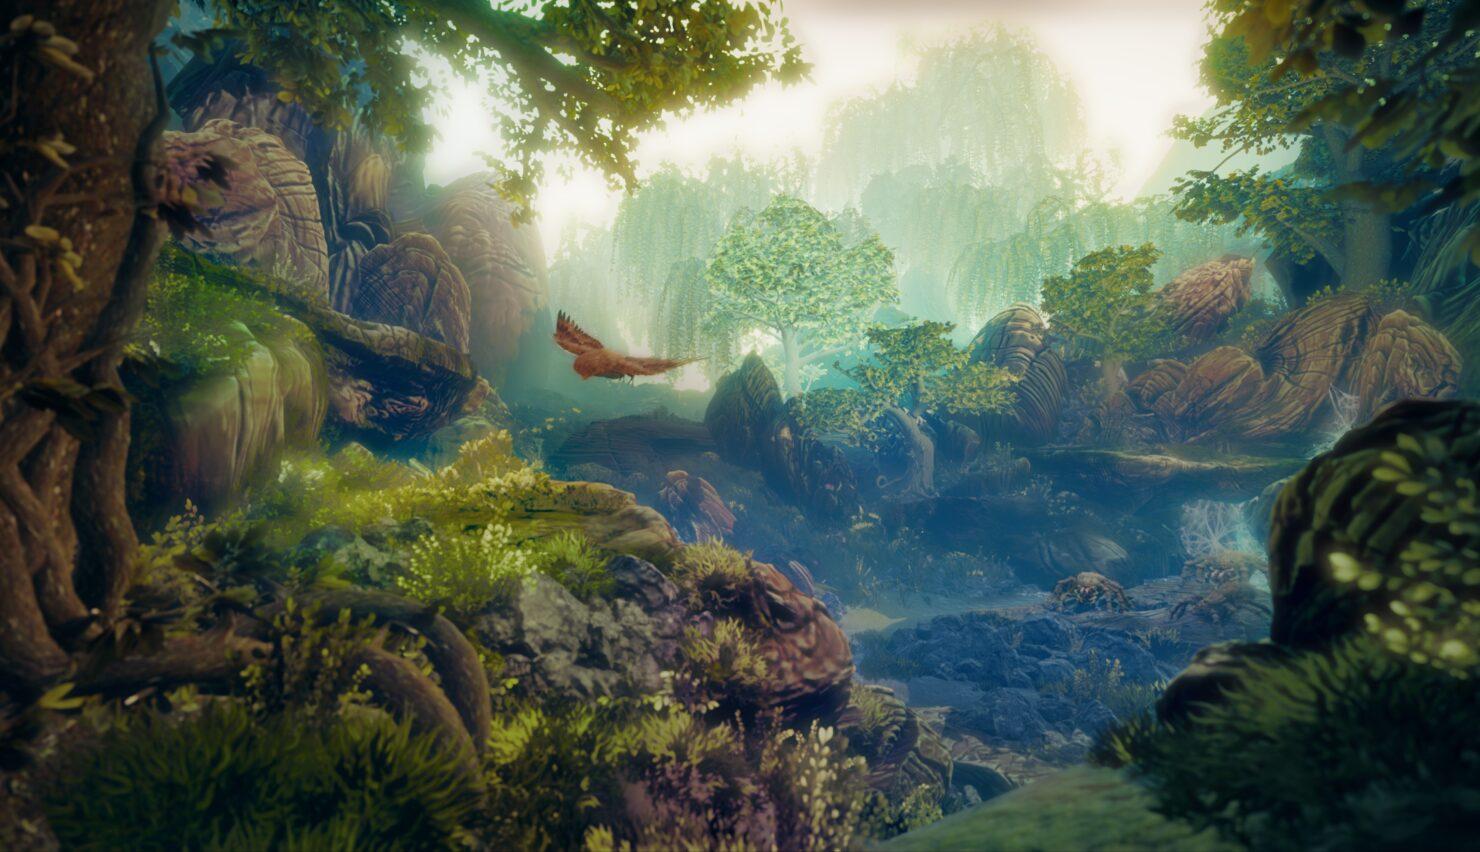 Daedalic показала первые скриншоты The Lord of the Rings: Gollum 4